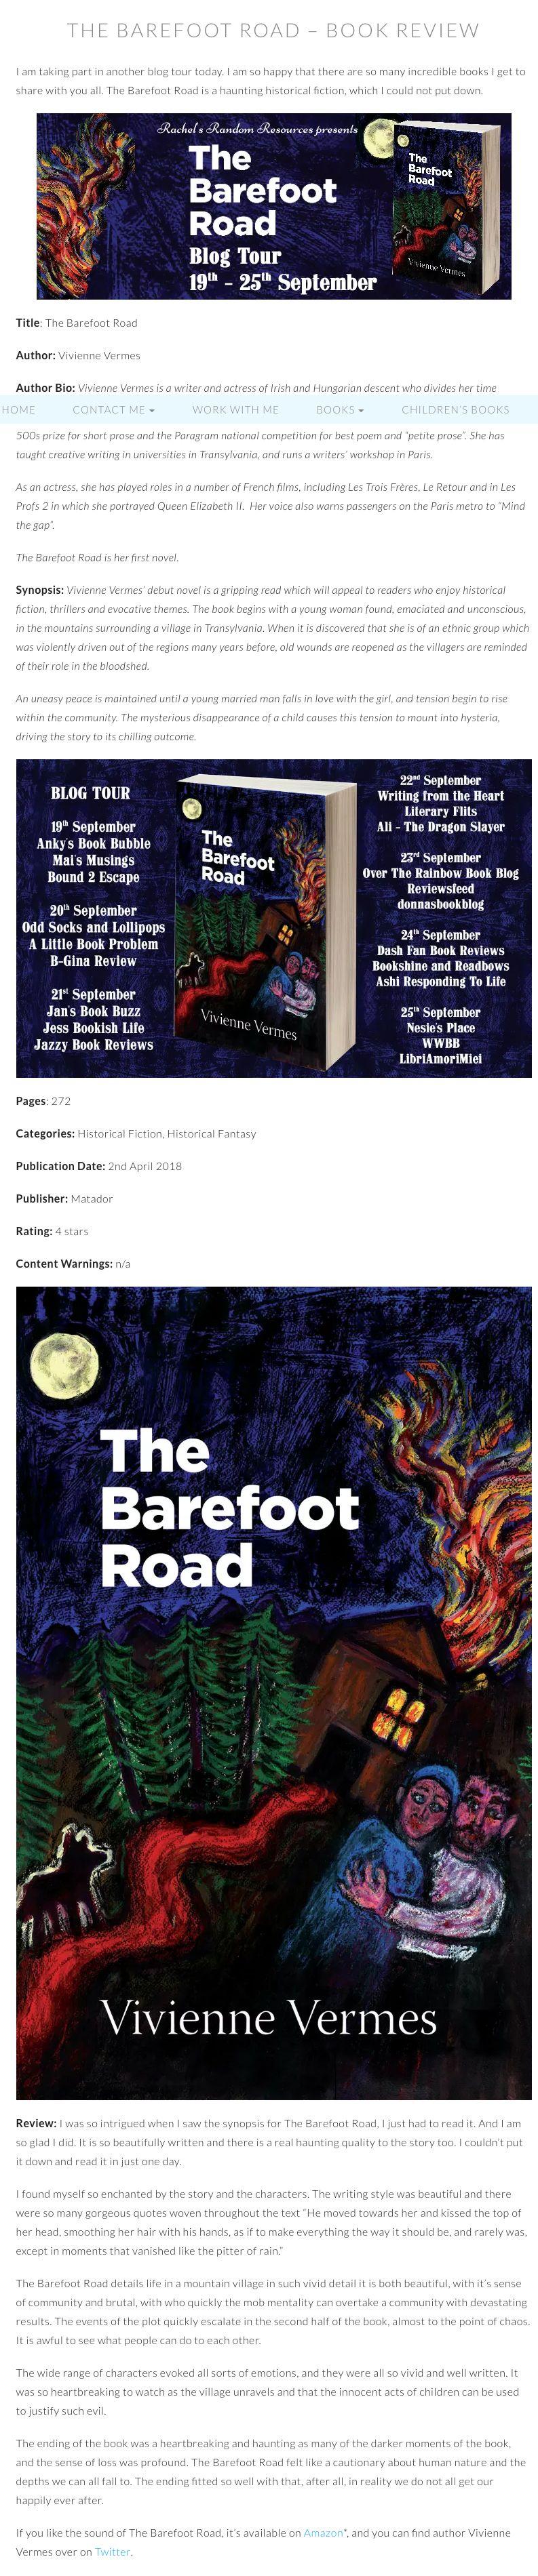 The Barefoot Road - Troubador Book Publishing